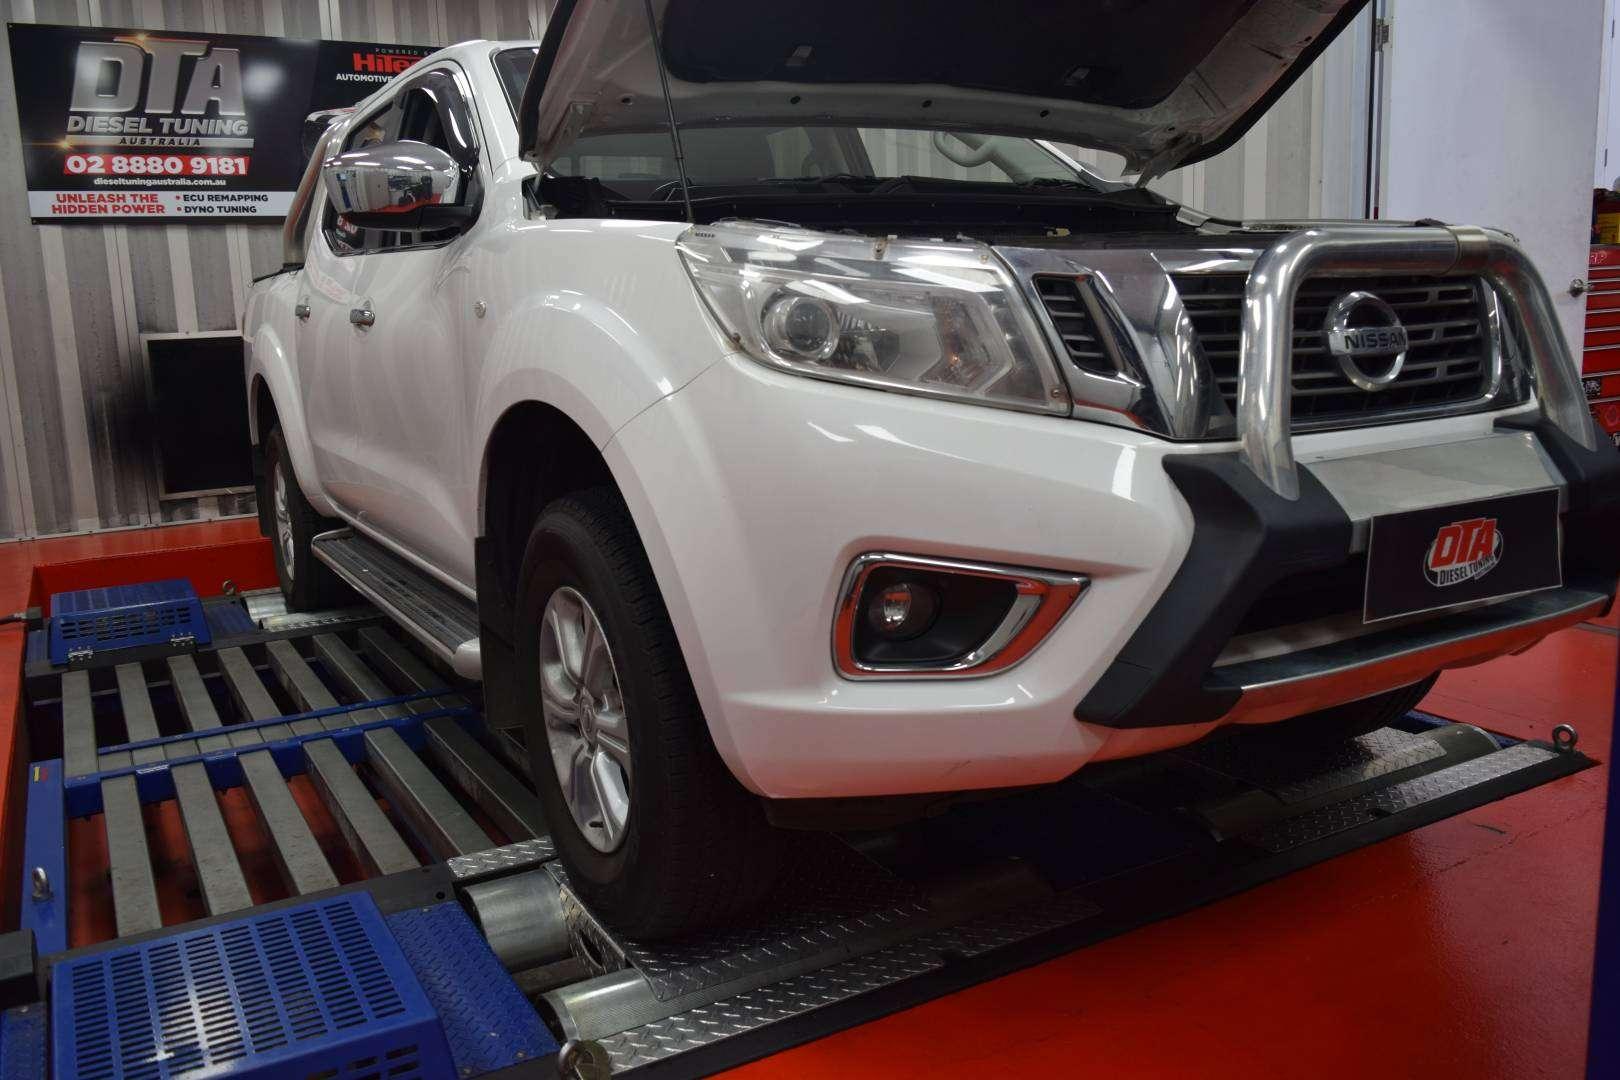 np 300 nissan navara tune remap vs chip diesel tuning australia rh dieseltuningaustralia com au Nissan Navara D40 Engine Nissan Note E11